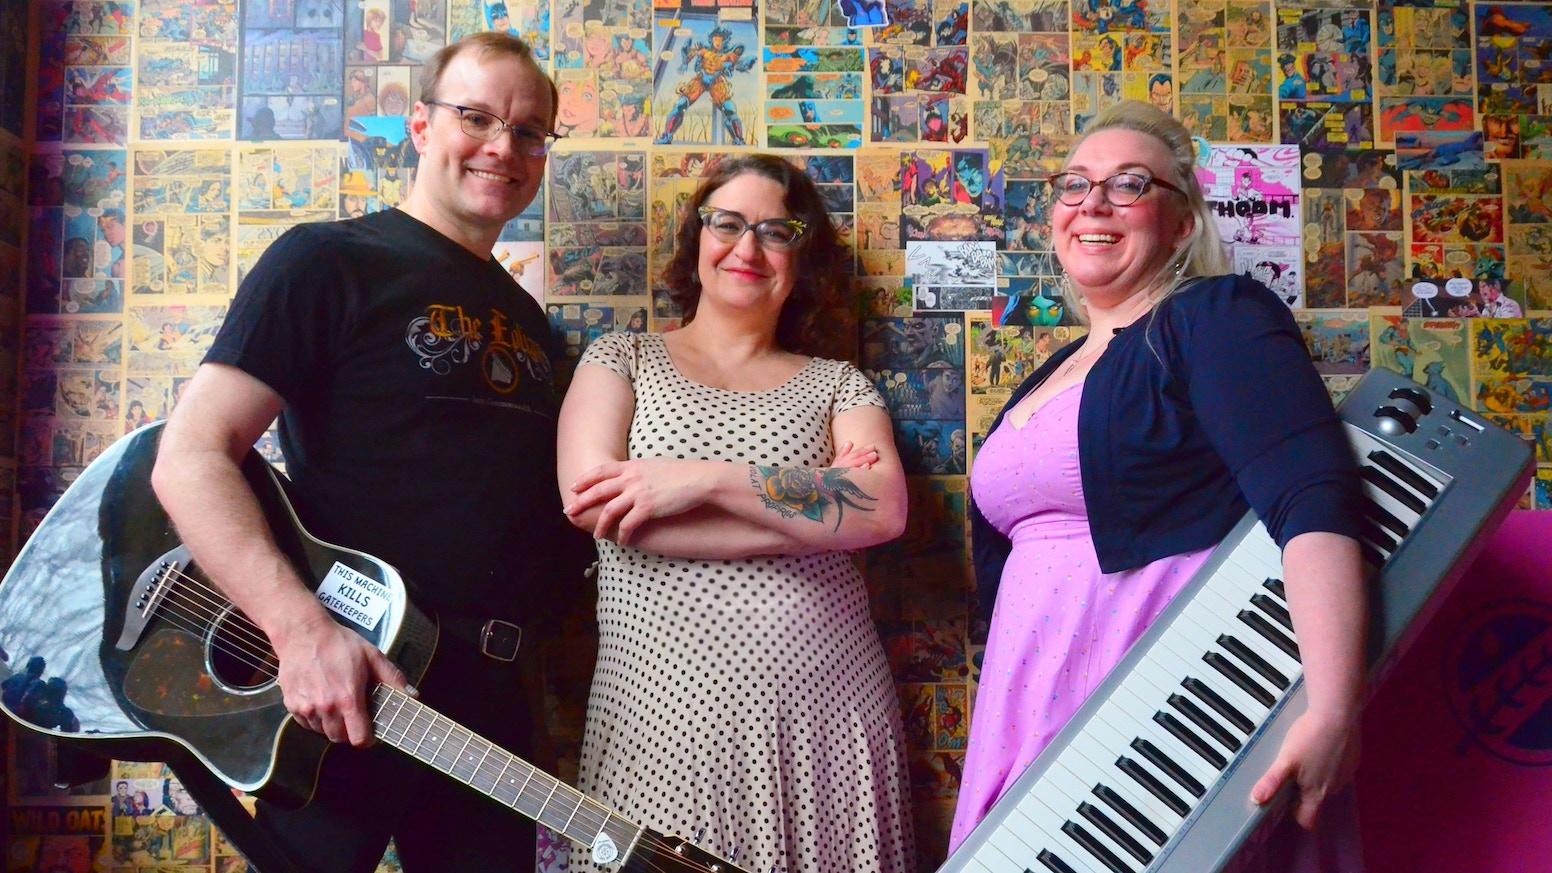 PDX's favorite nerdy trio aspire to make fifth studio album, go on tour, film at 11.